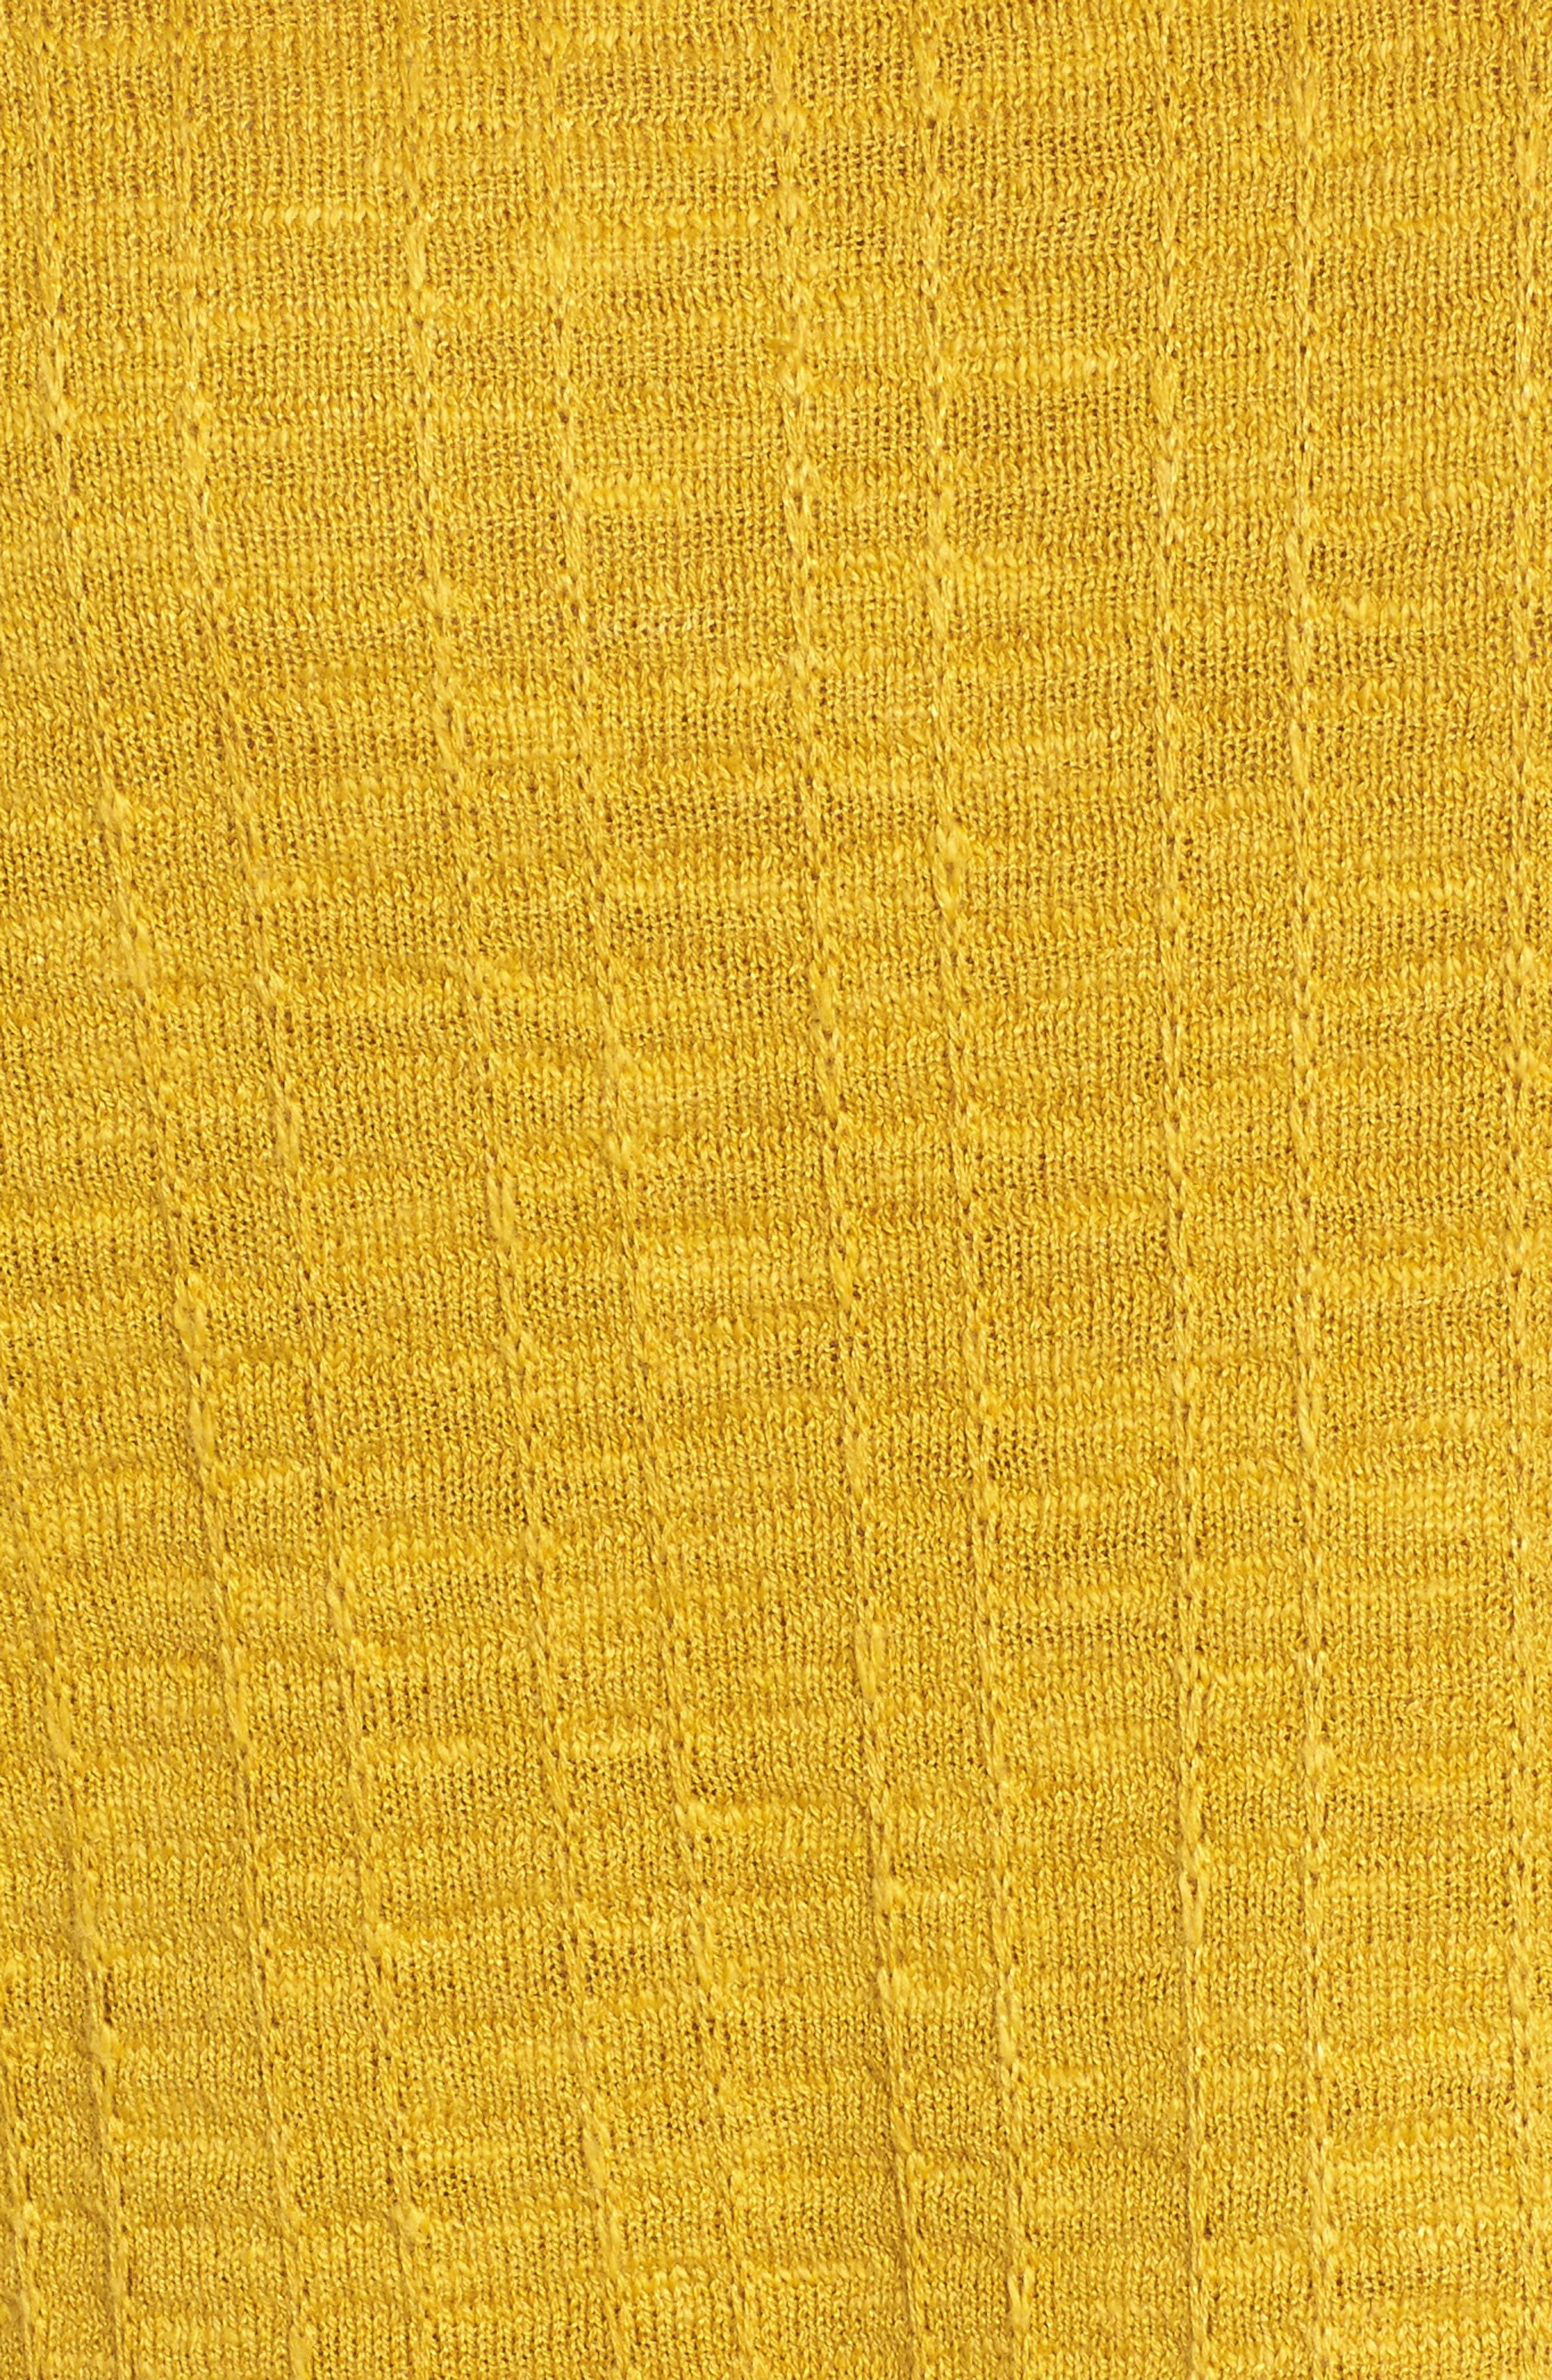 Organic Linen & Cotton Sweater,                             Alternate thumbnail 5, color,                             Mustard Seed